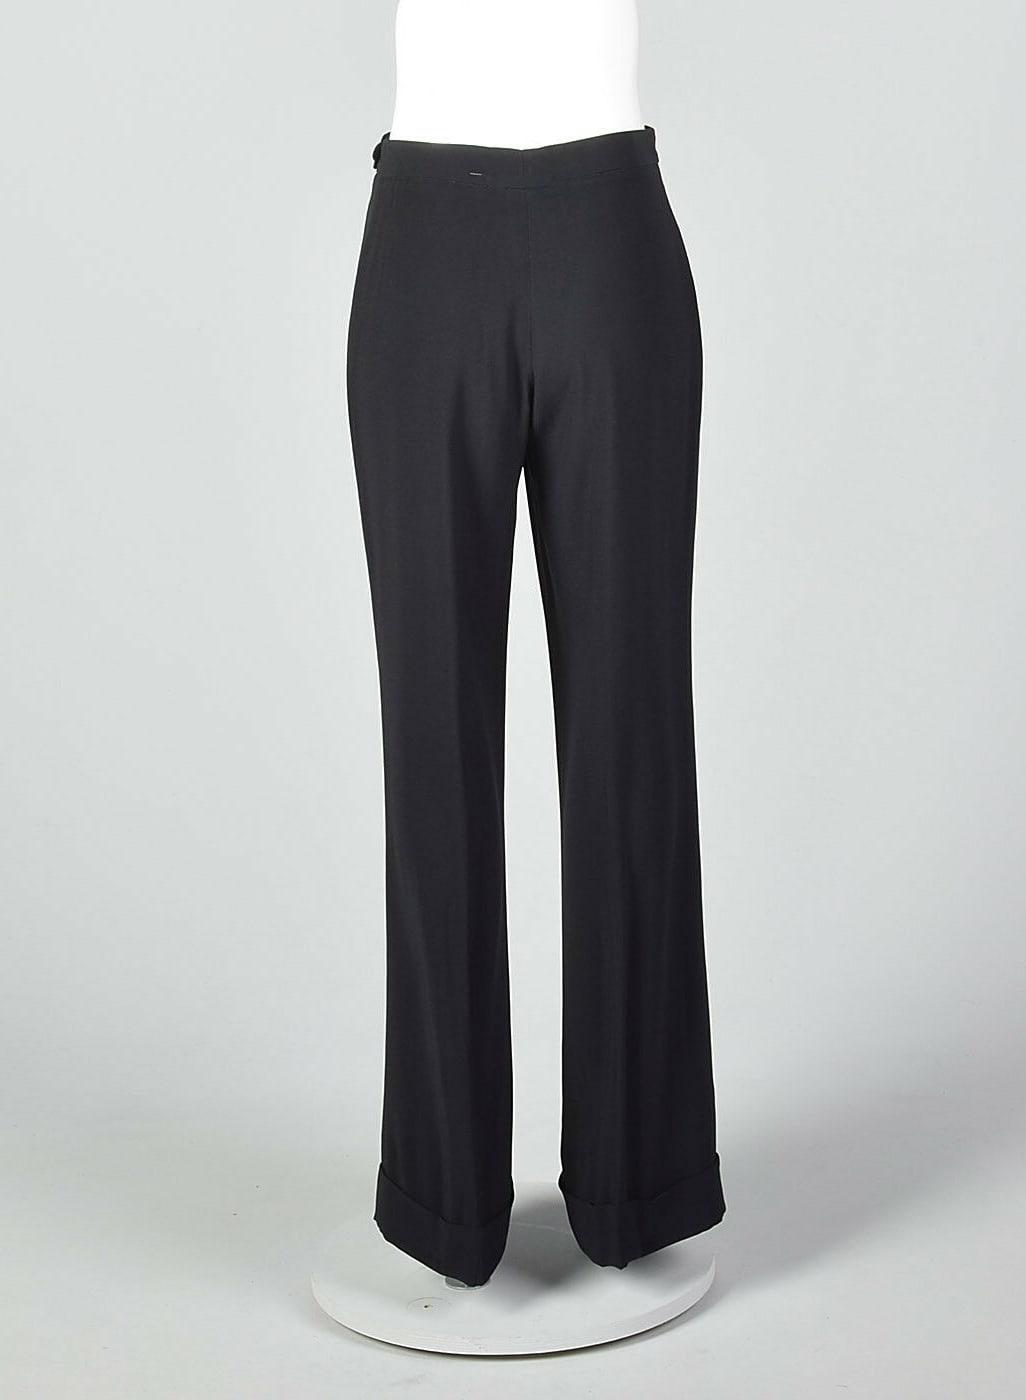 S 2010s Maison Margiela Black Straight Leg Pants Cuffed Hem Trousers Separates